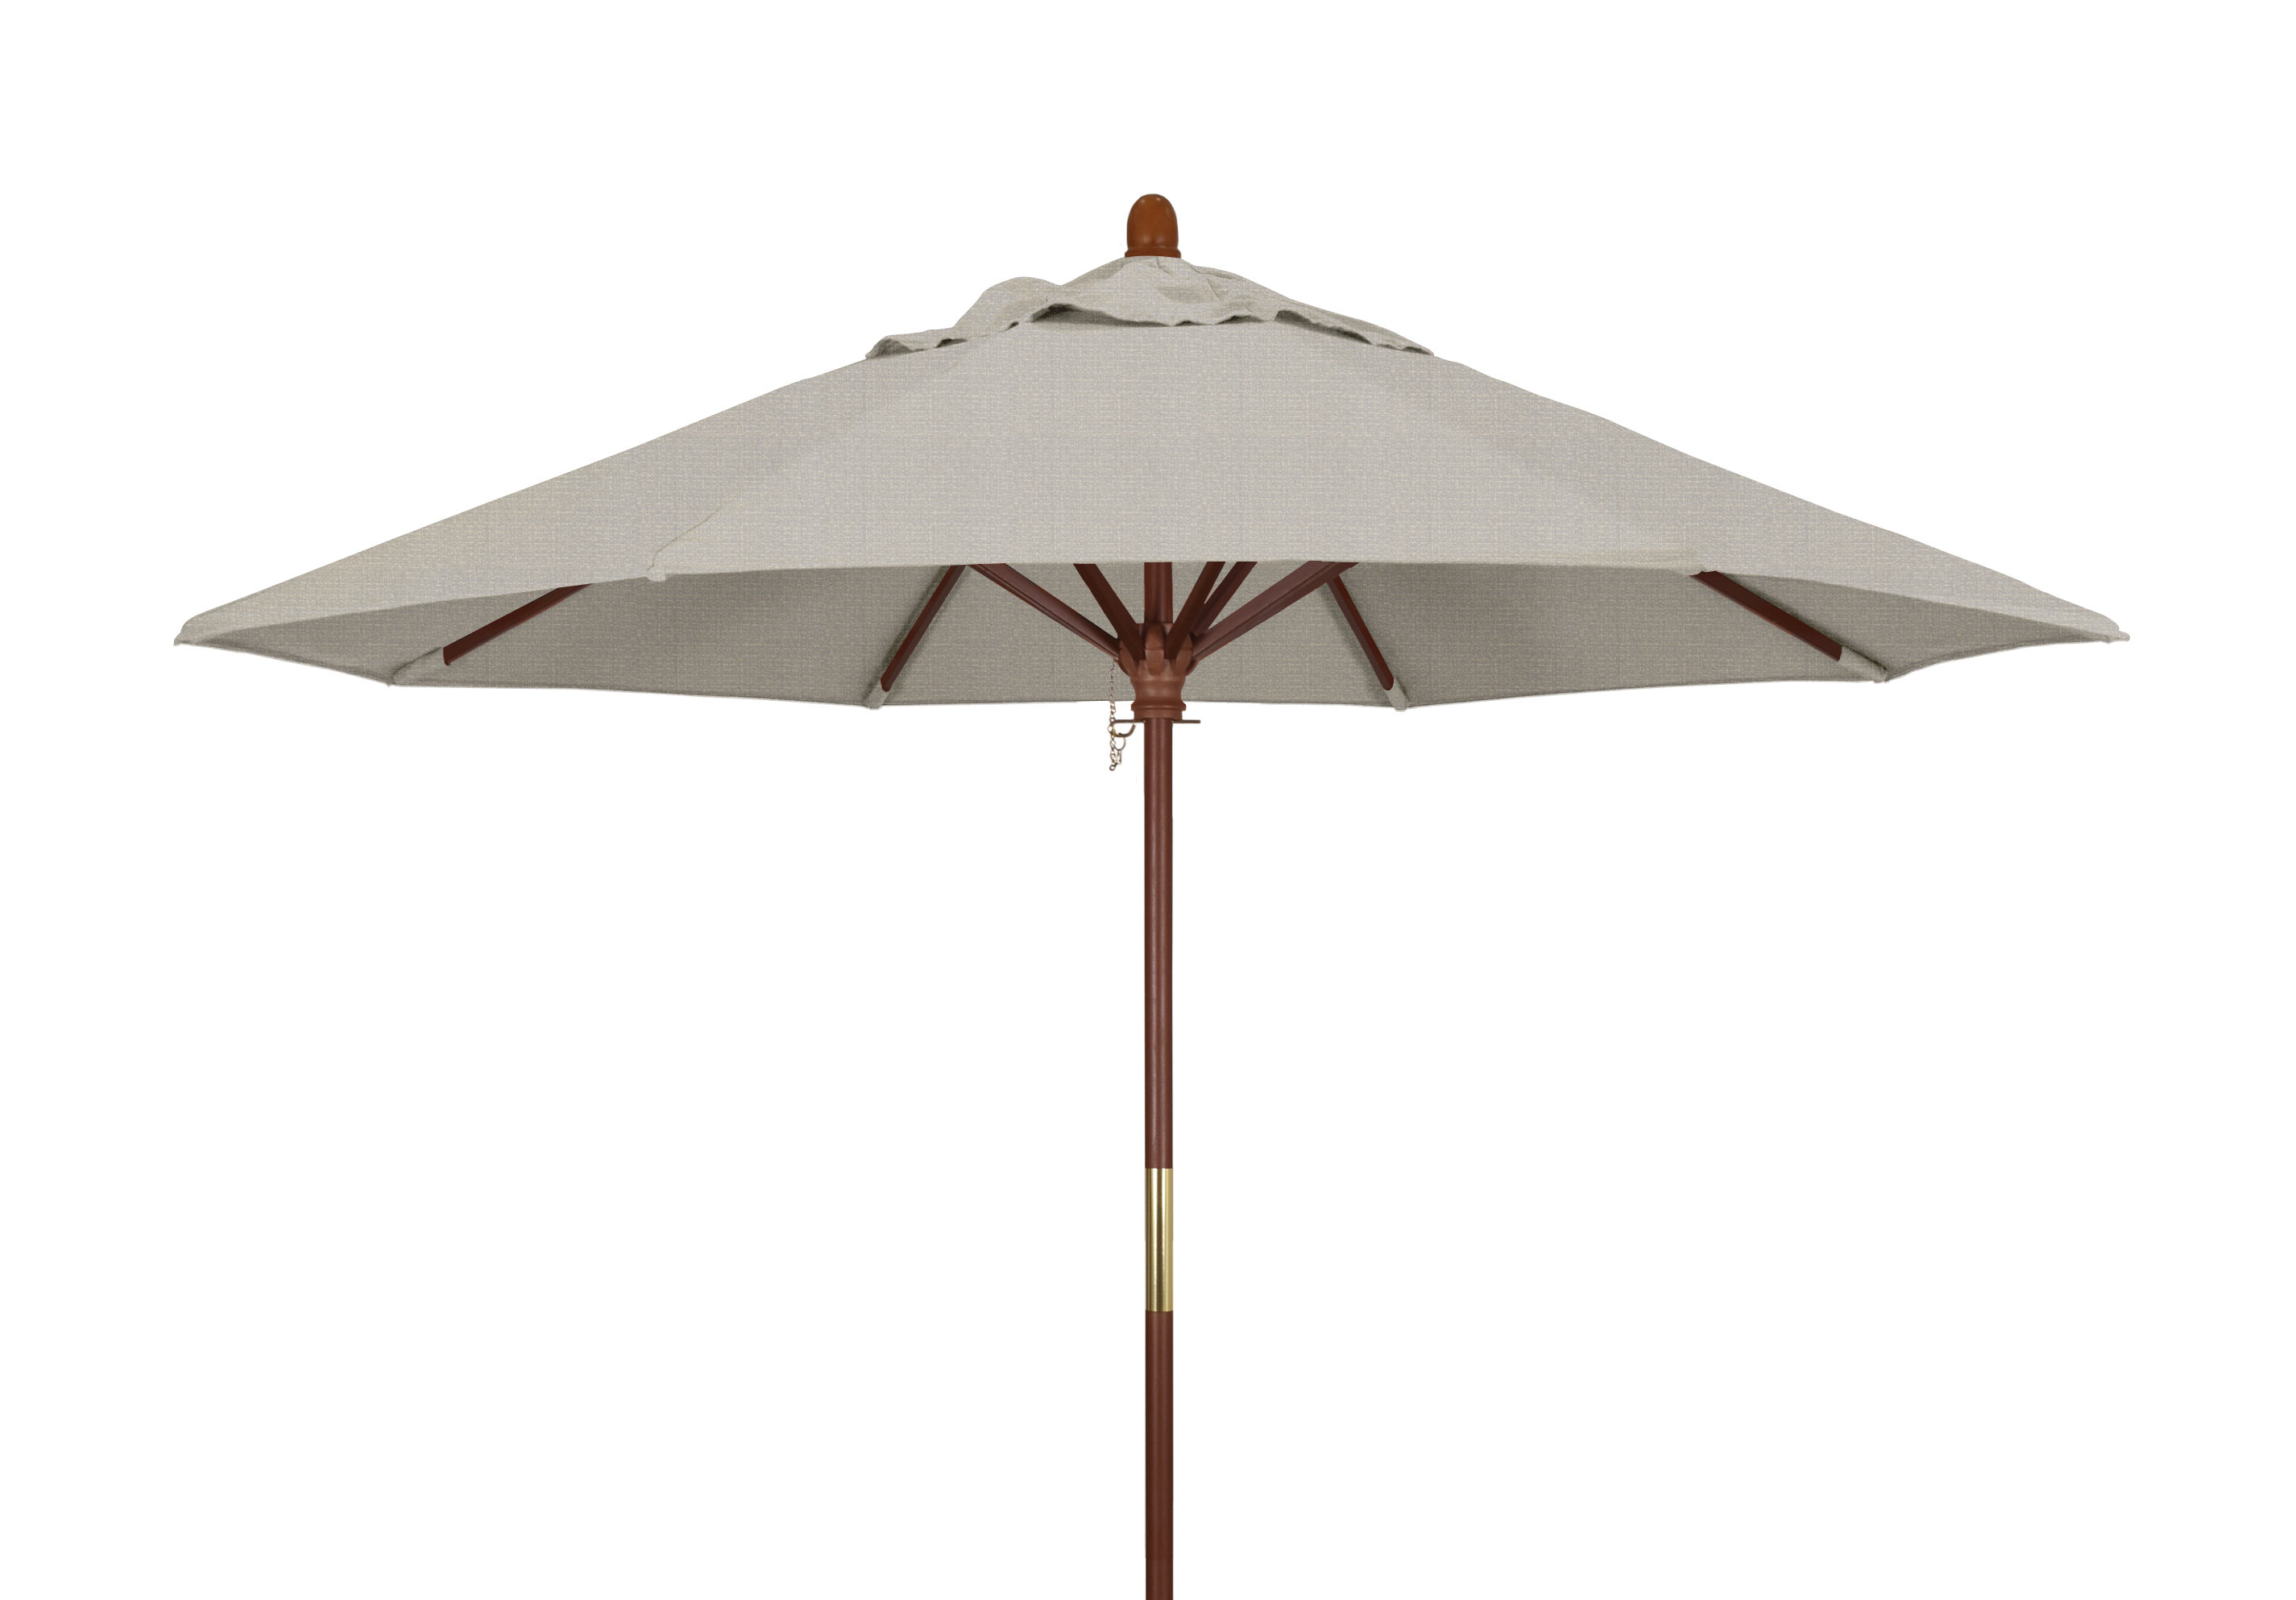 Mraz 9' Market Umbrella With Regard To Newest Mraz Market Umbrellas (View 7 of 20)